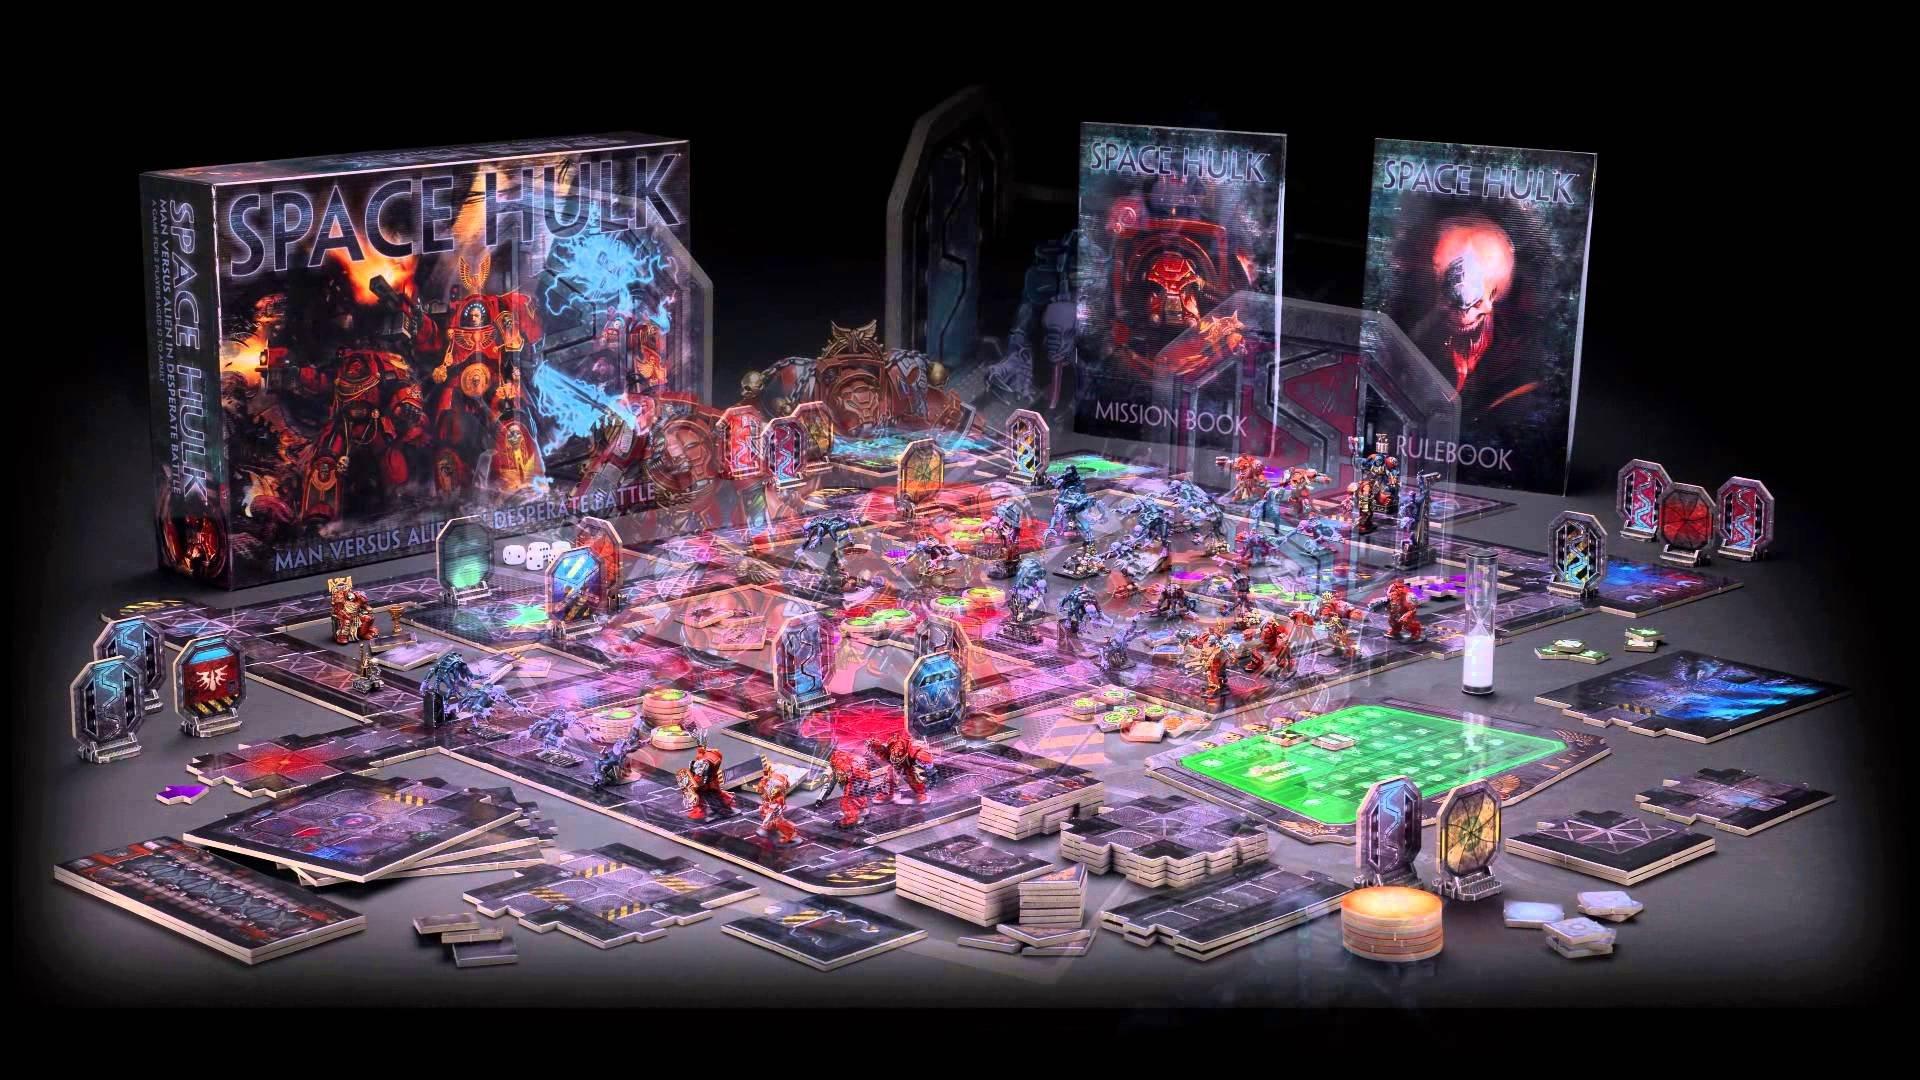 With Science Warhammer Fantasy Mad Scientist Quest: SPACE HULK Deathwing Fantasy Fighting Warhammer Action